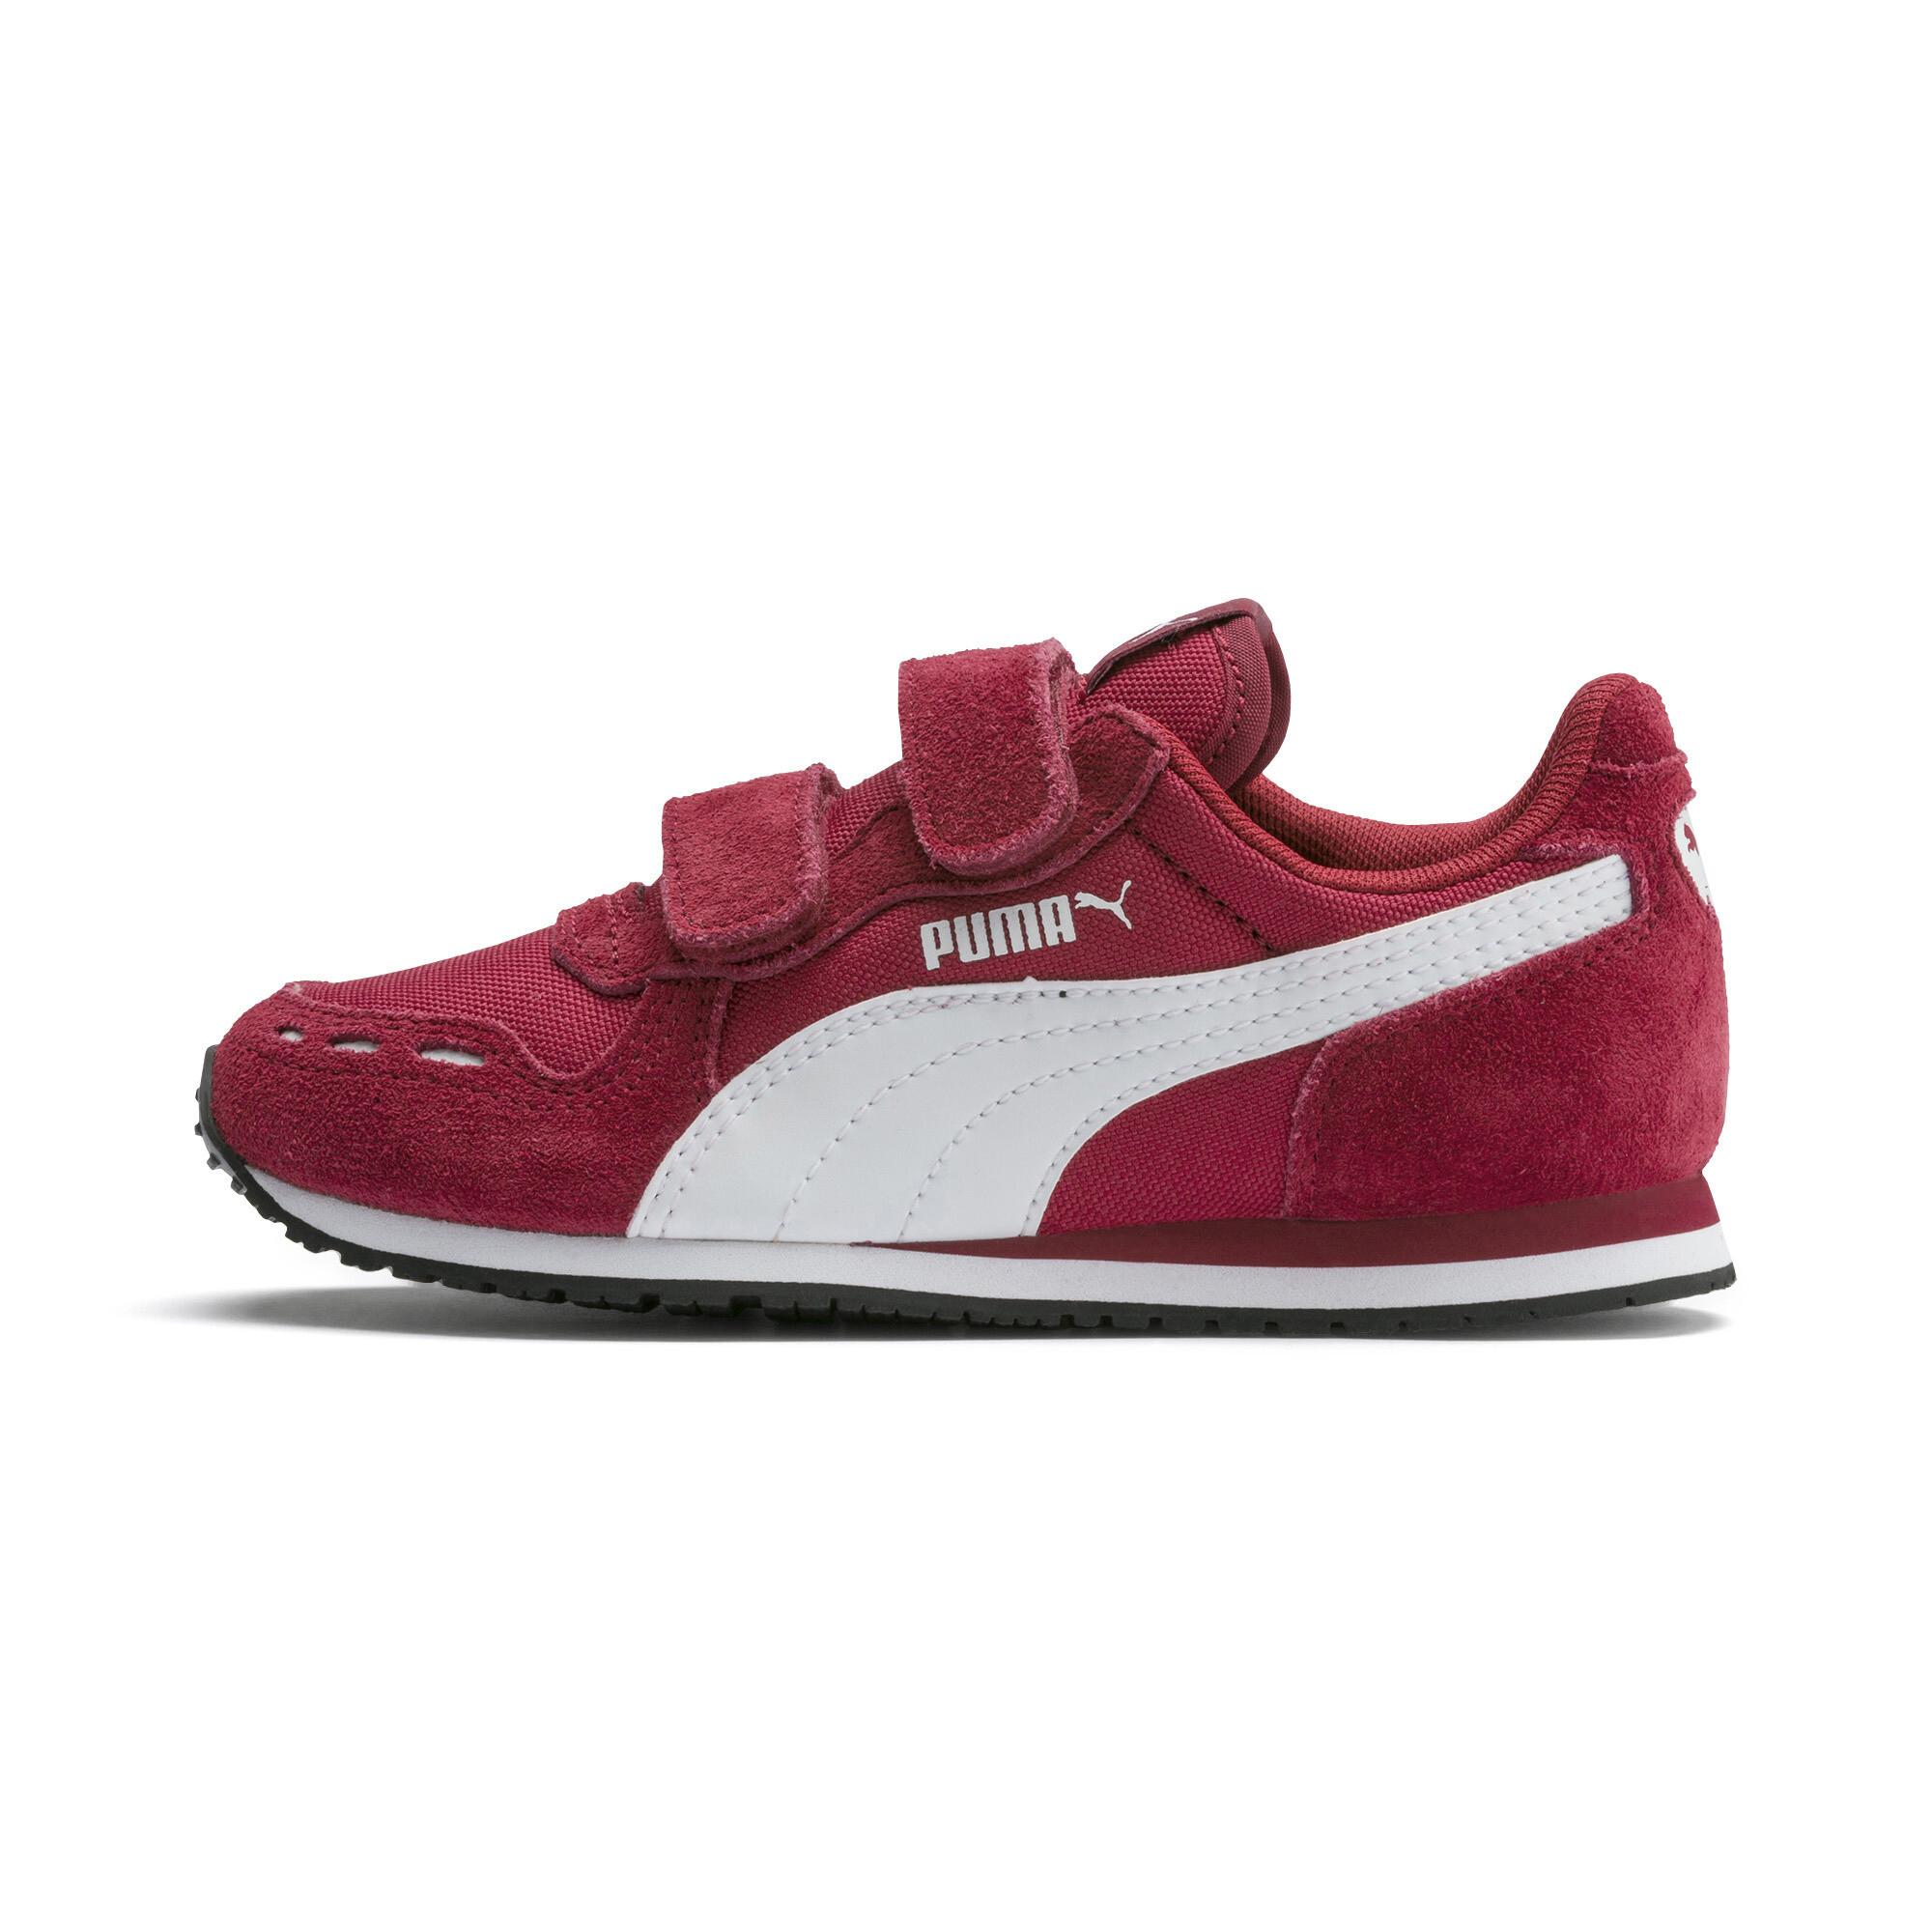 PUMA-Cabana-Racer-Little-Kids-039-Shoes-Kids-Shoe-Kids thumbnail 4